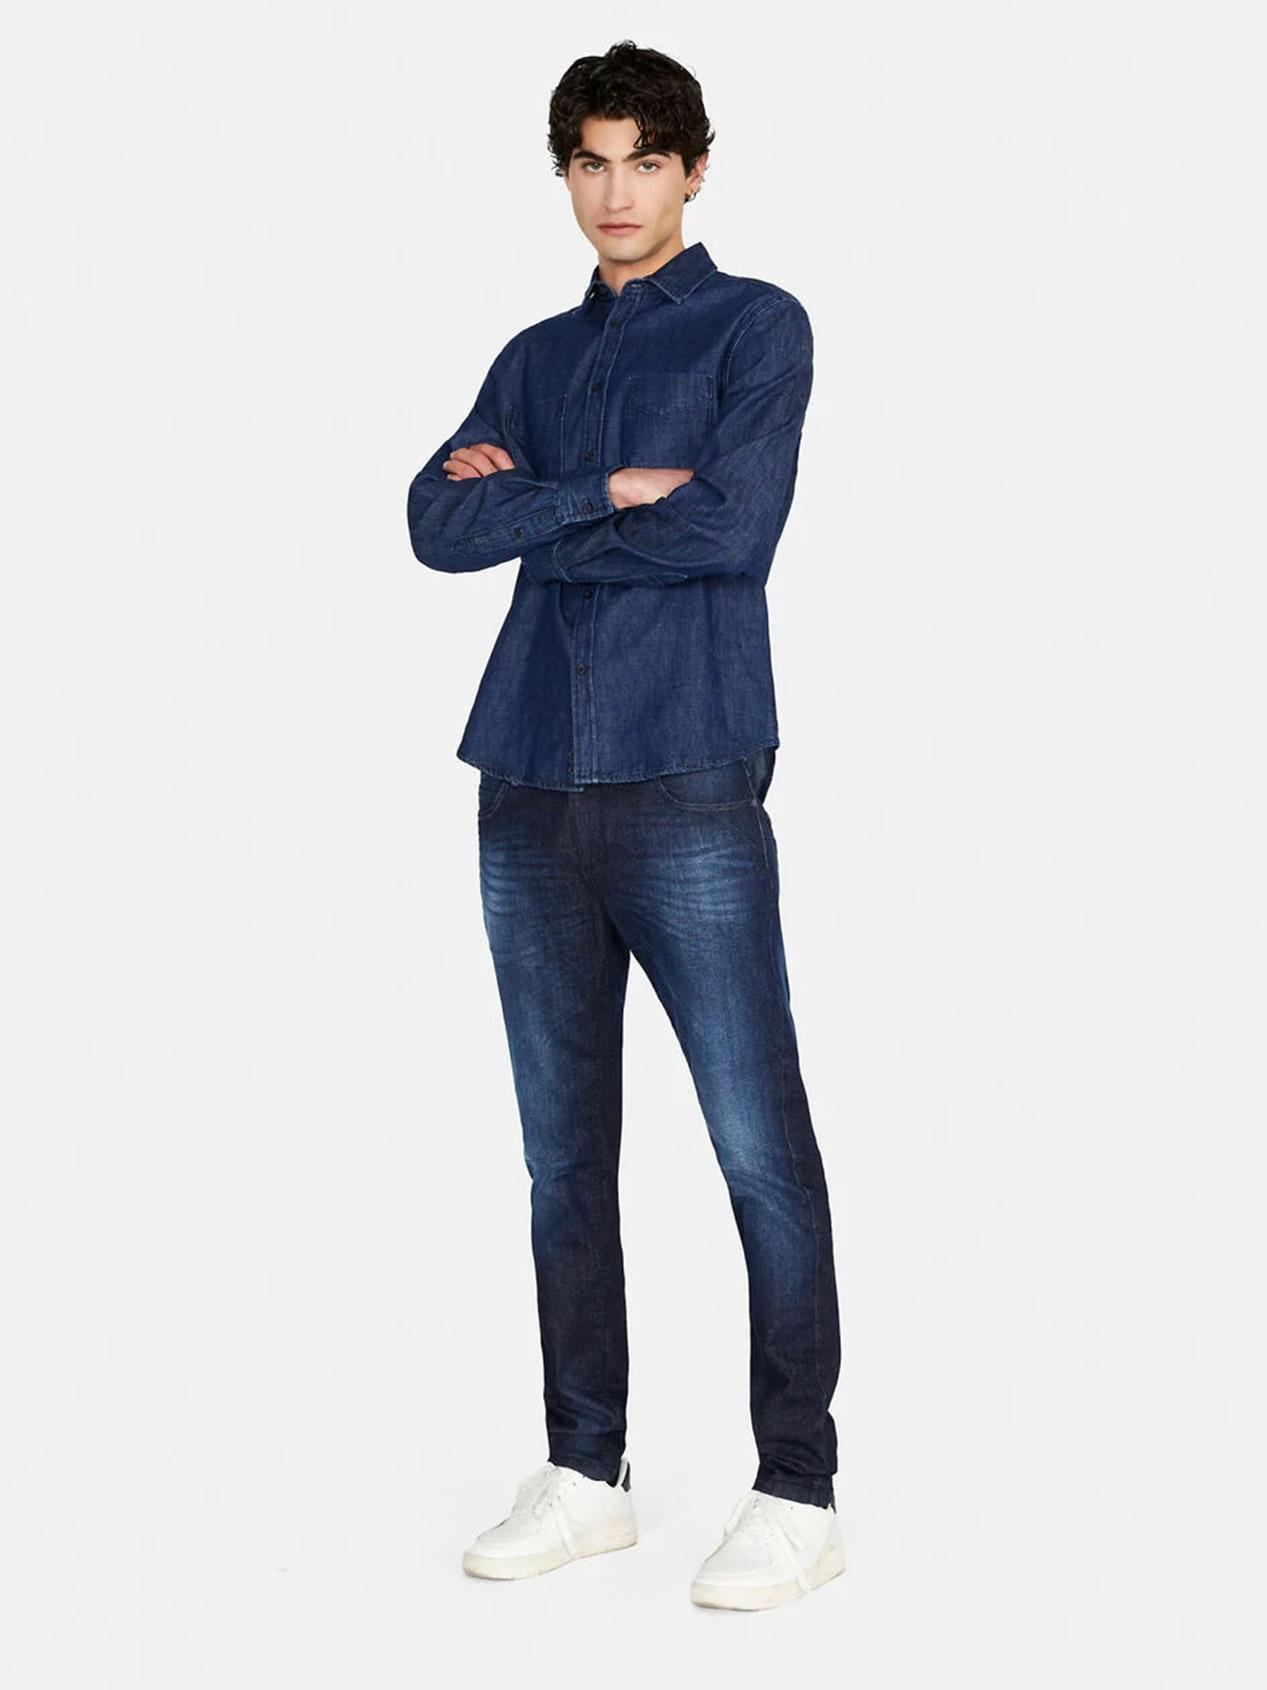 Jeans Skinny Fit Herren